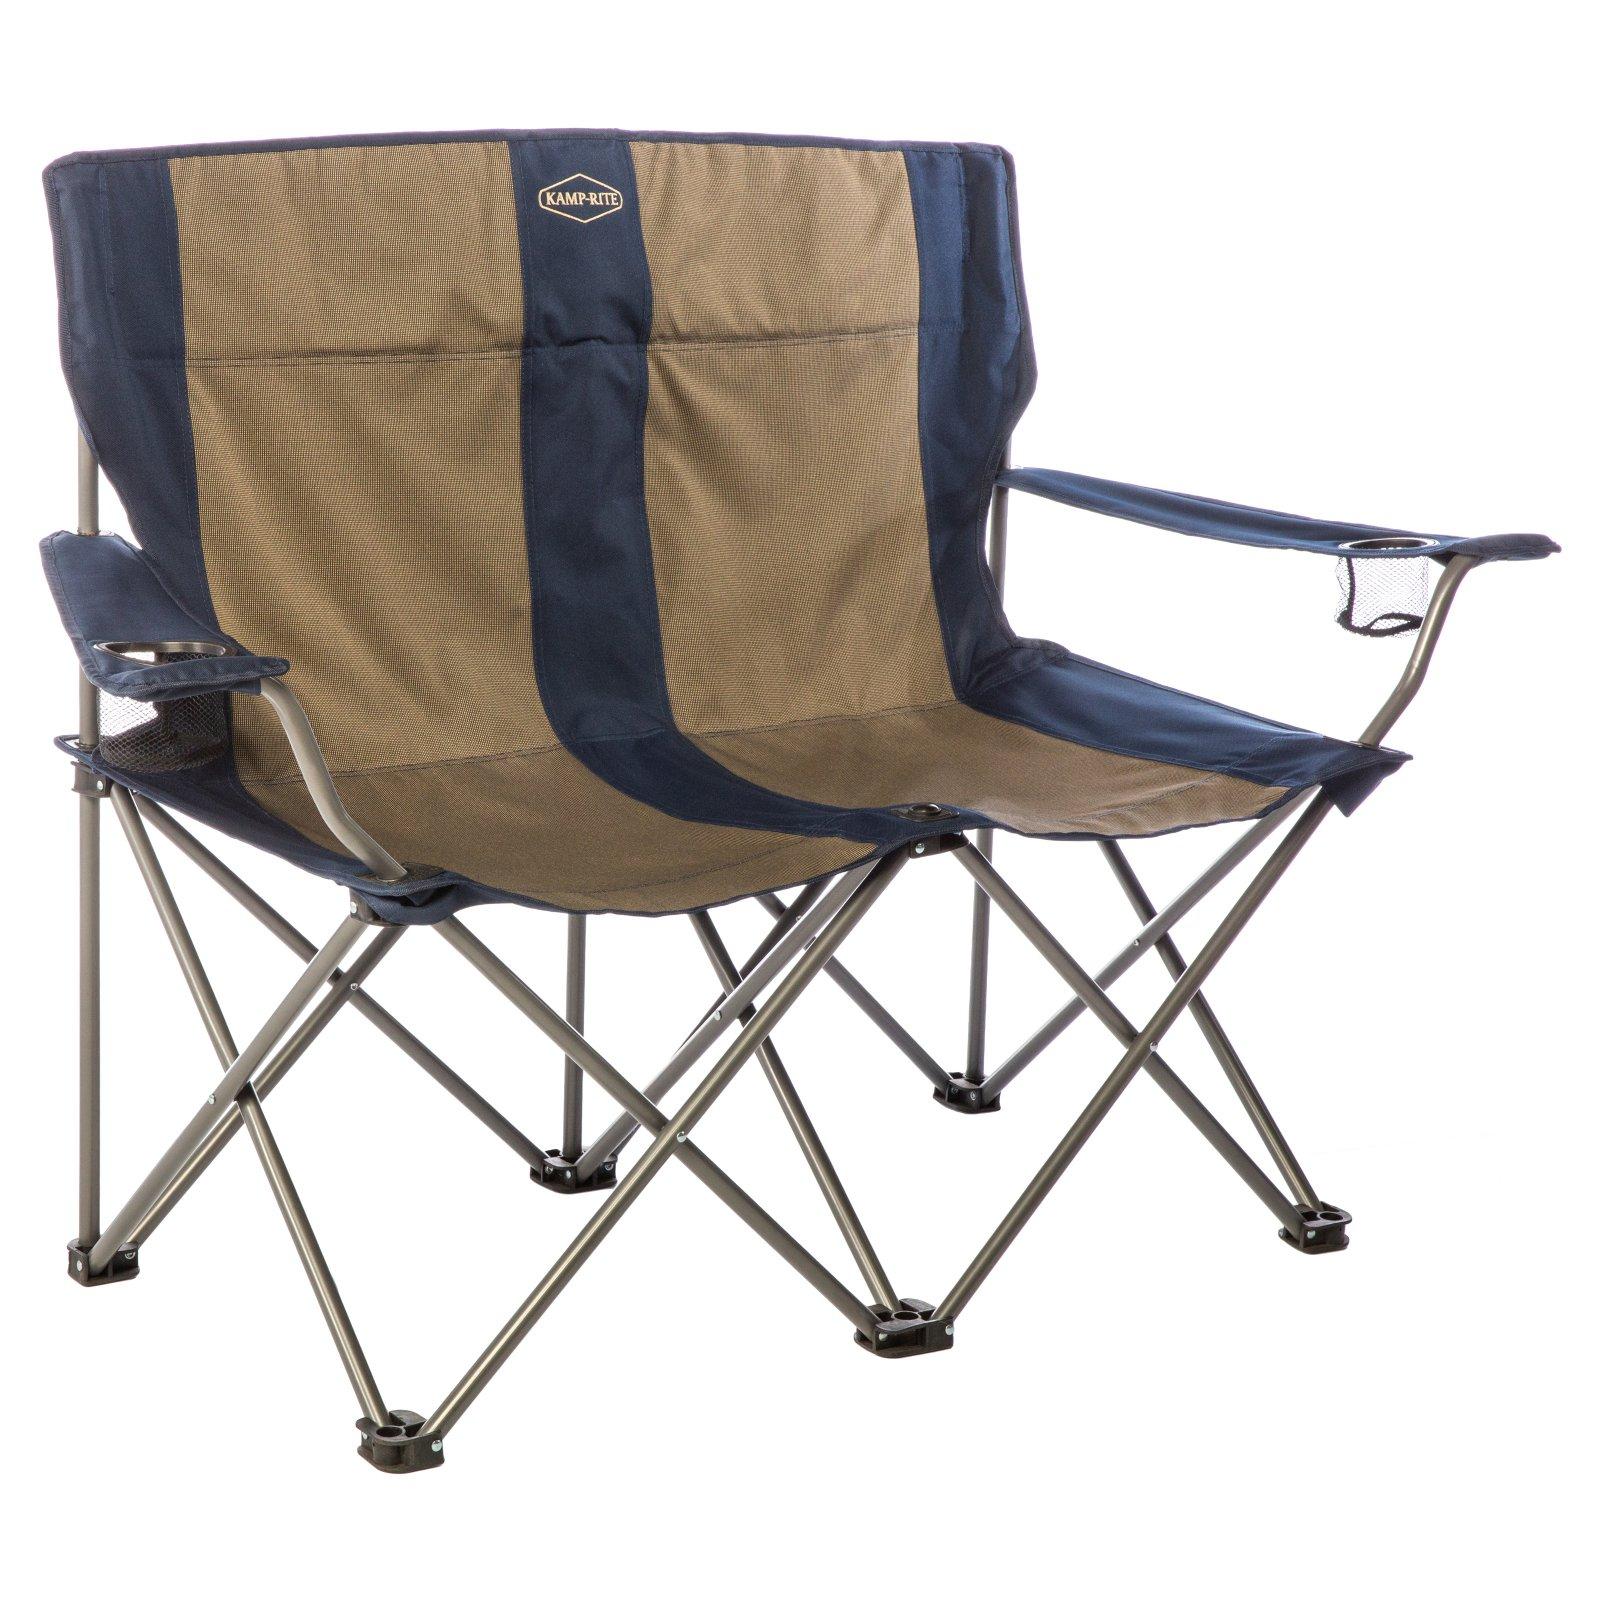 Double Seat Folding Lawn Chair